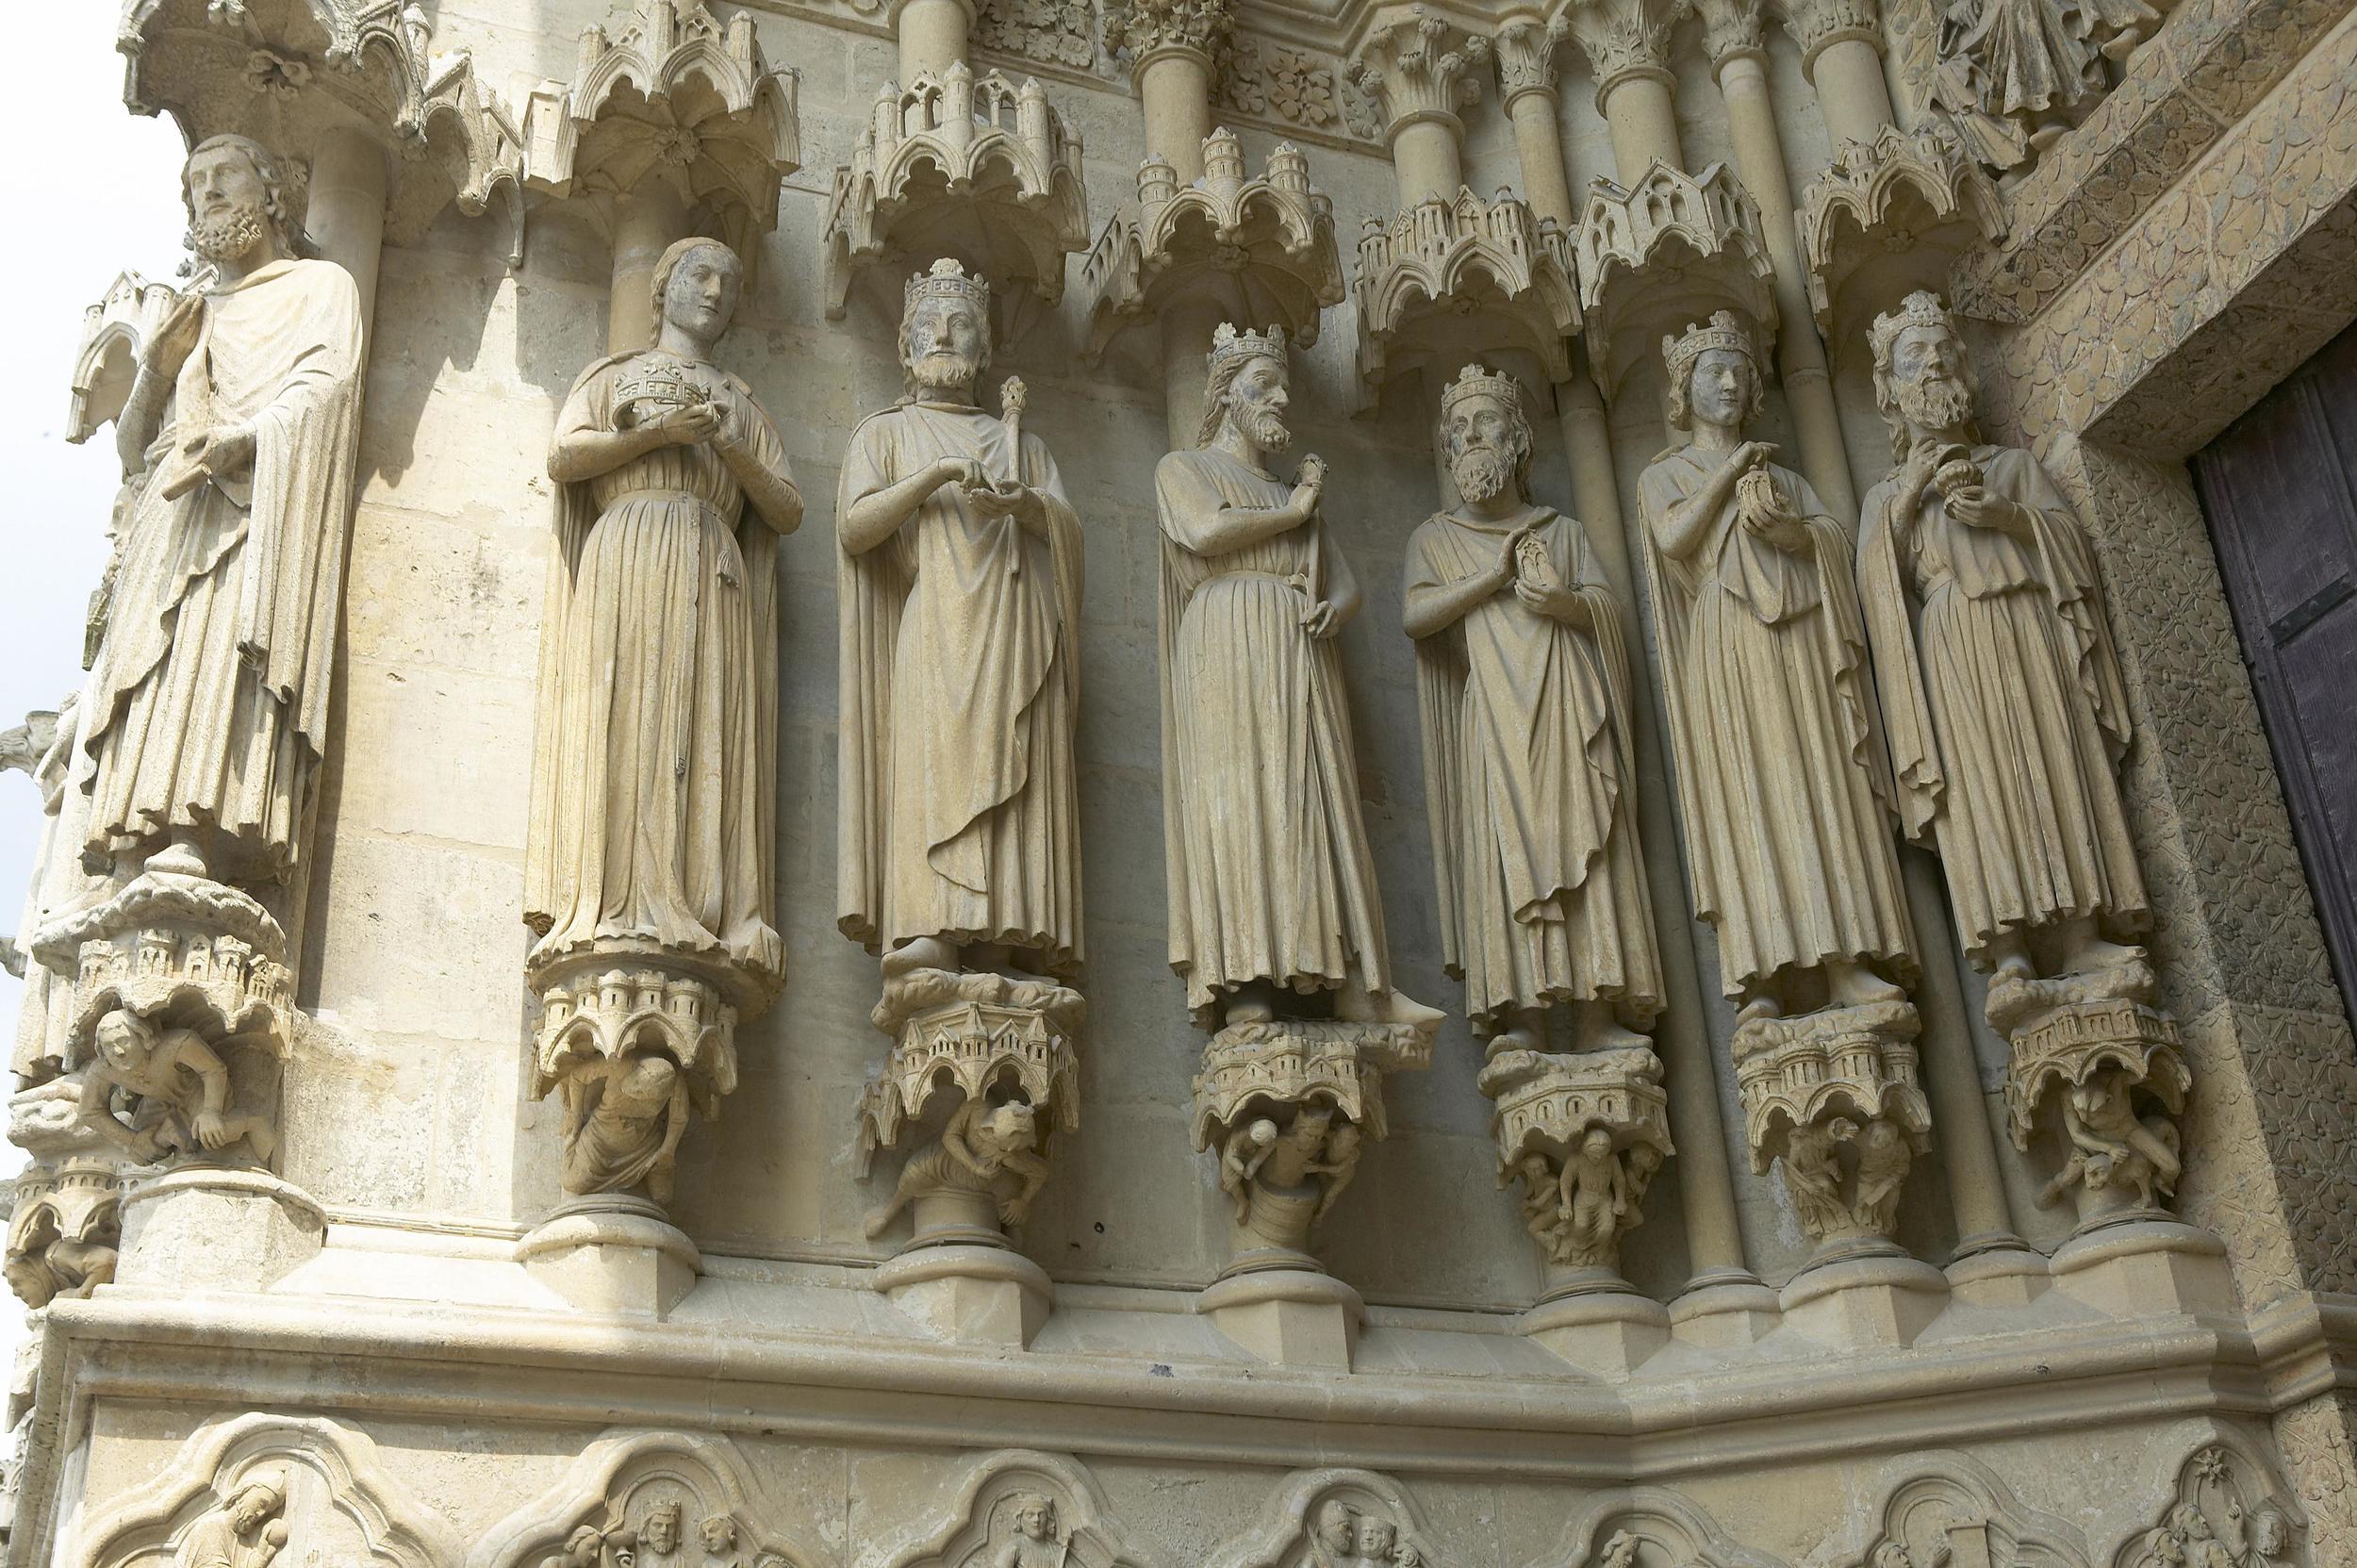 Jamb Figures: The Three Magi, Herod, Solomon, and Sheba